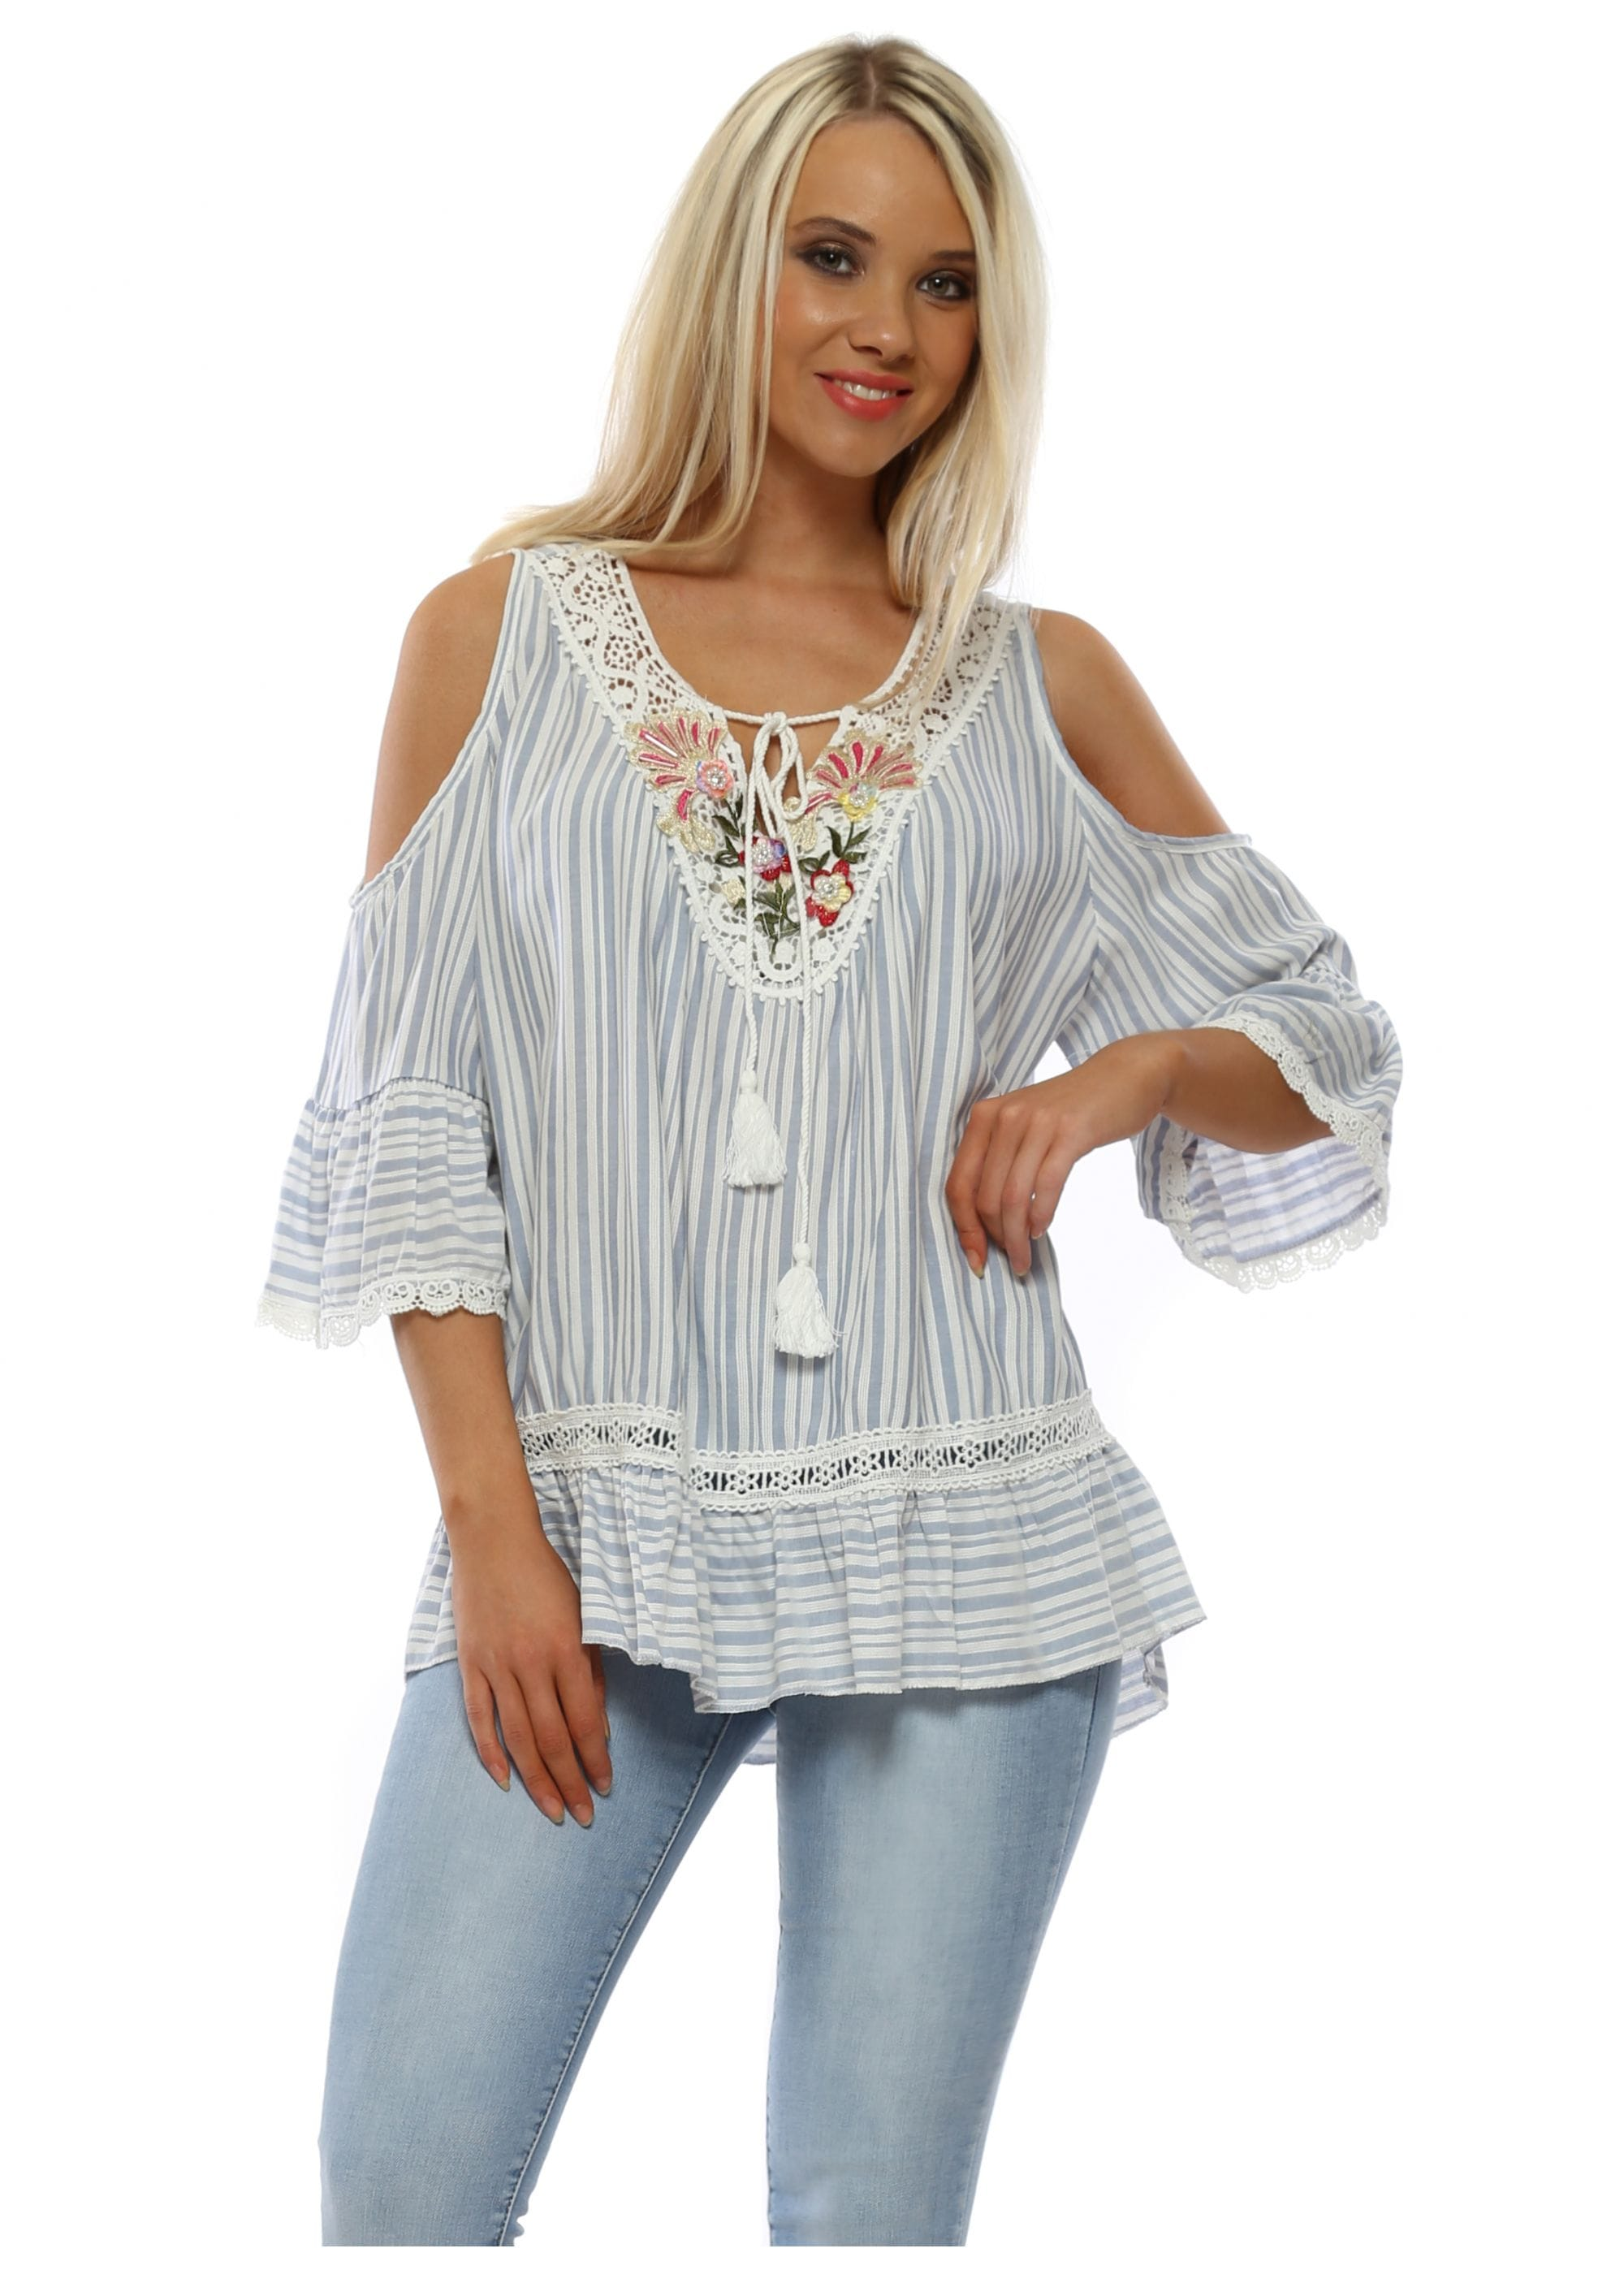 788a85ac40d Pinka Blue Striped Top | Cold Shoulder Tops | Designer Desirables